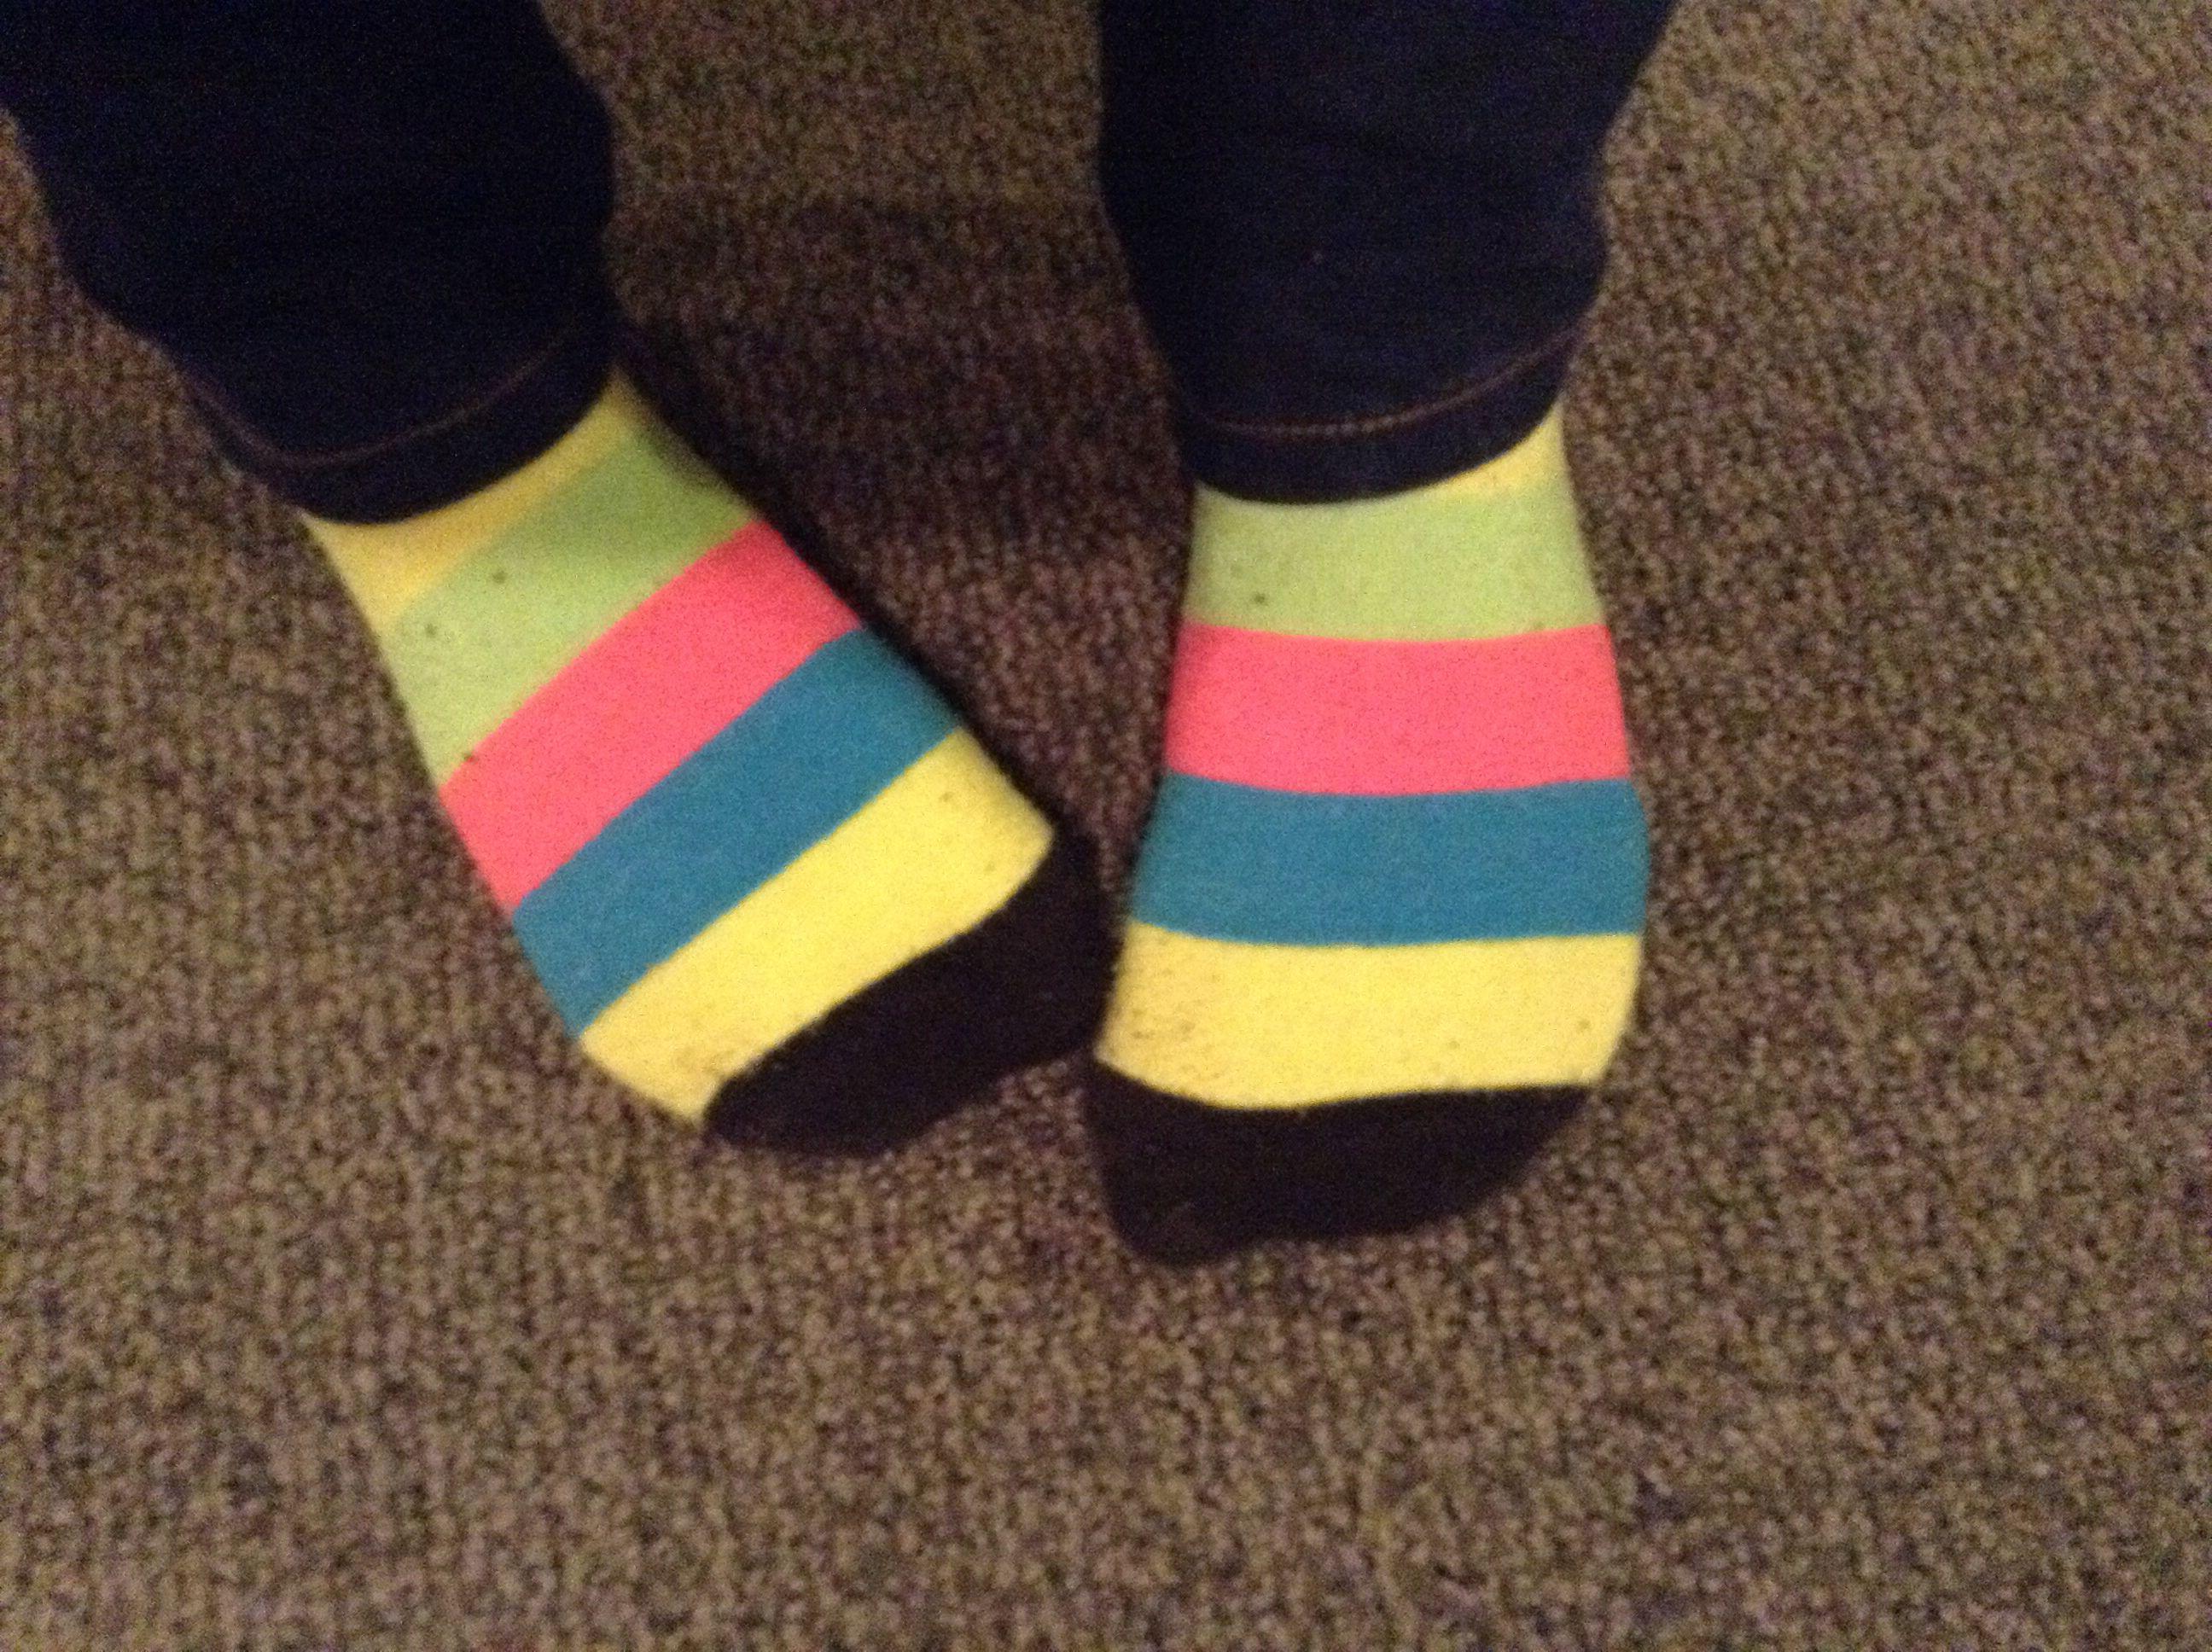 Today IM actually wearing matching socks !!!!